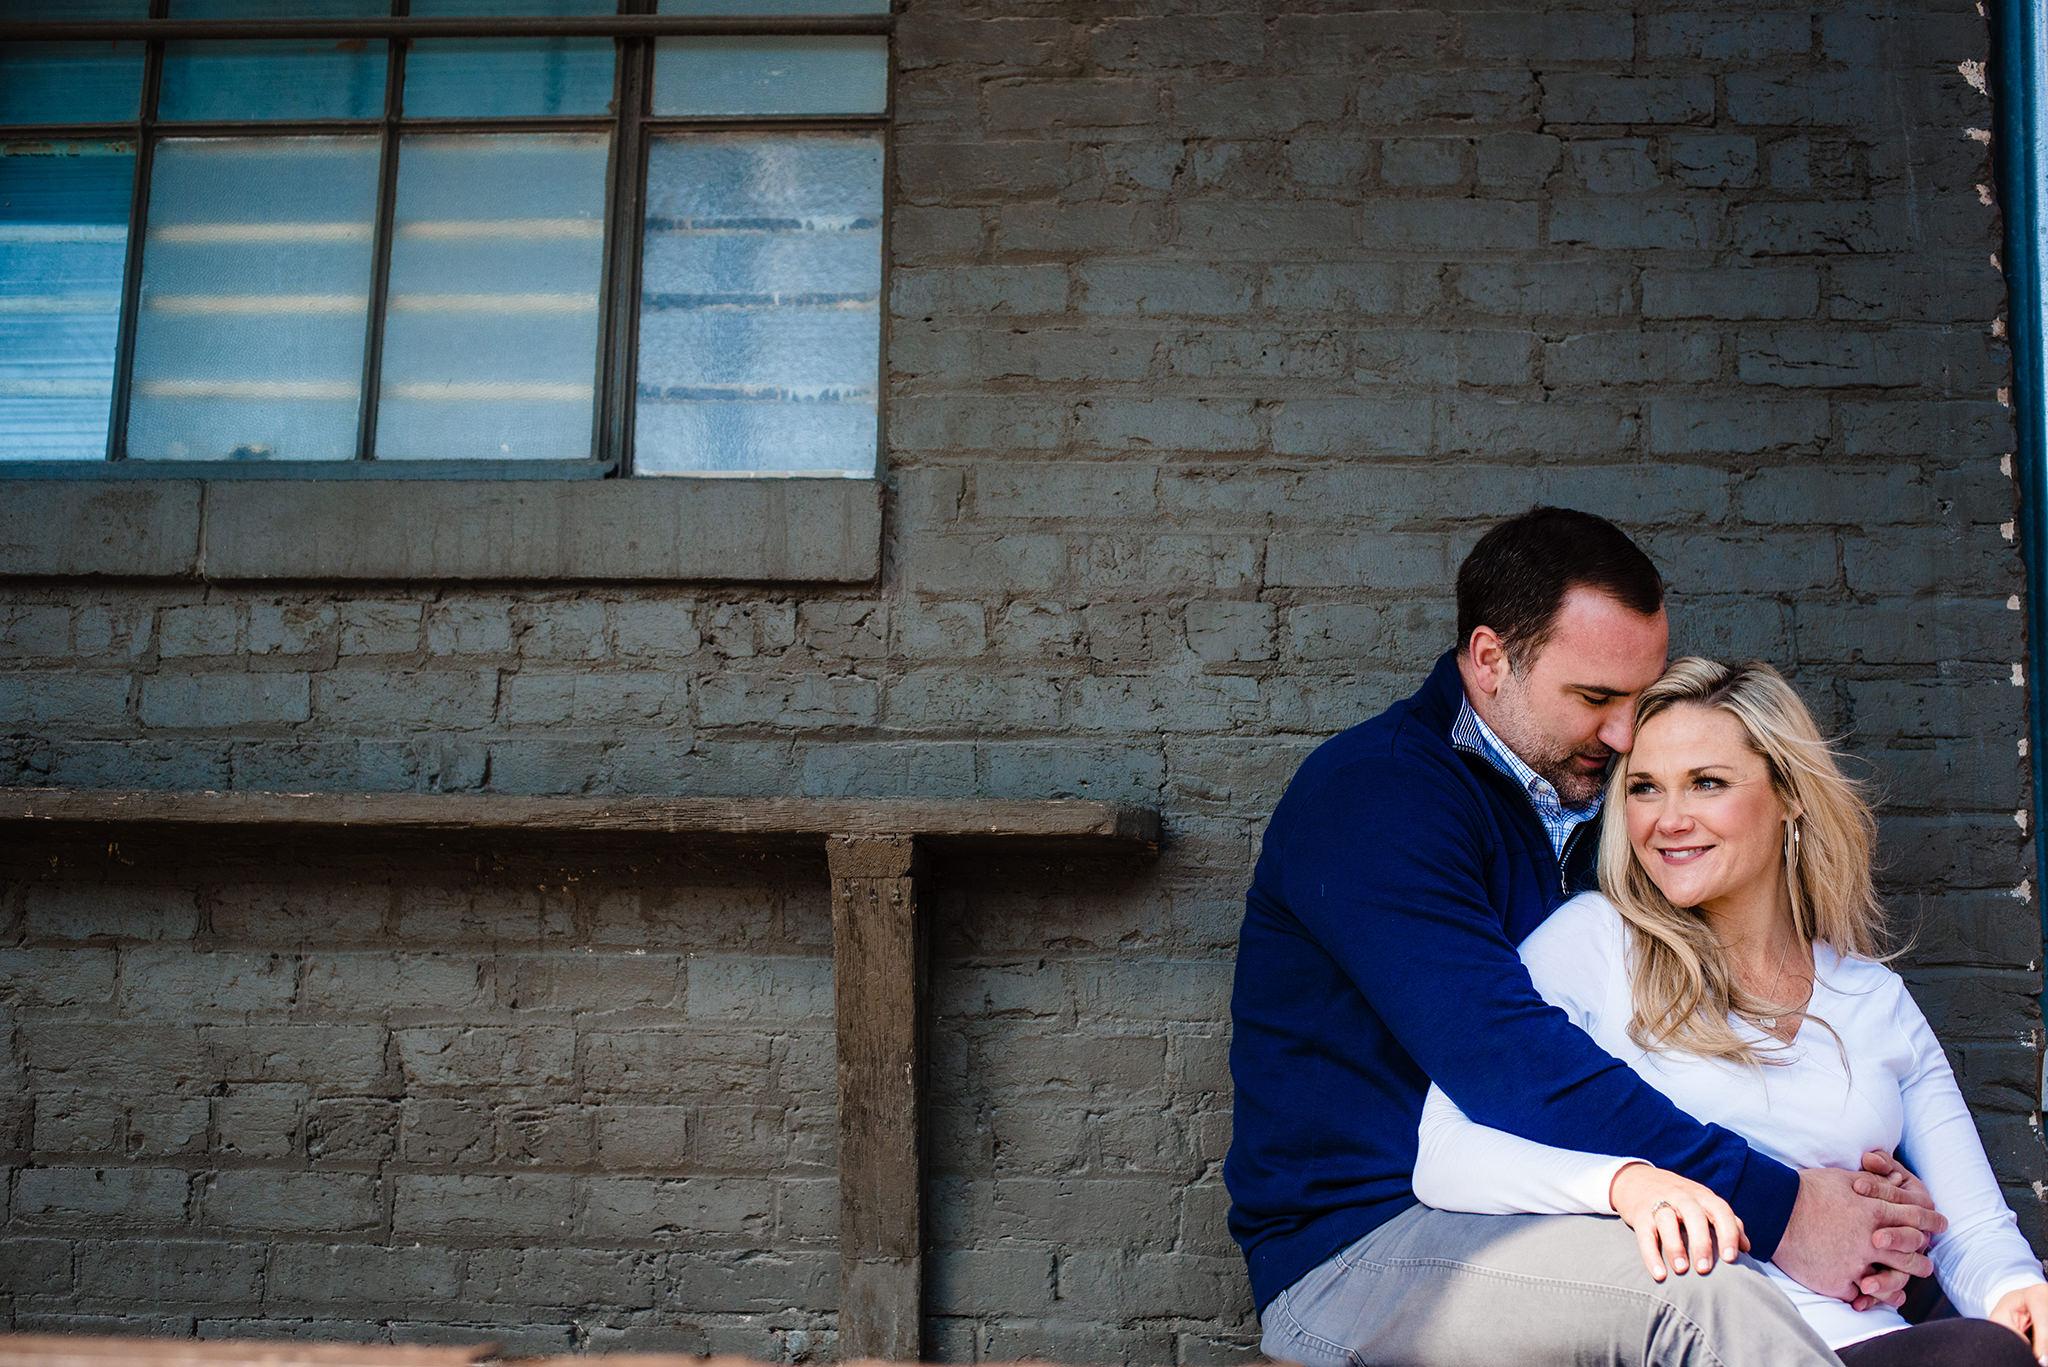 omaha-wedding-photographers-jm-studios-engagement-photos-03.jpg